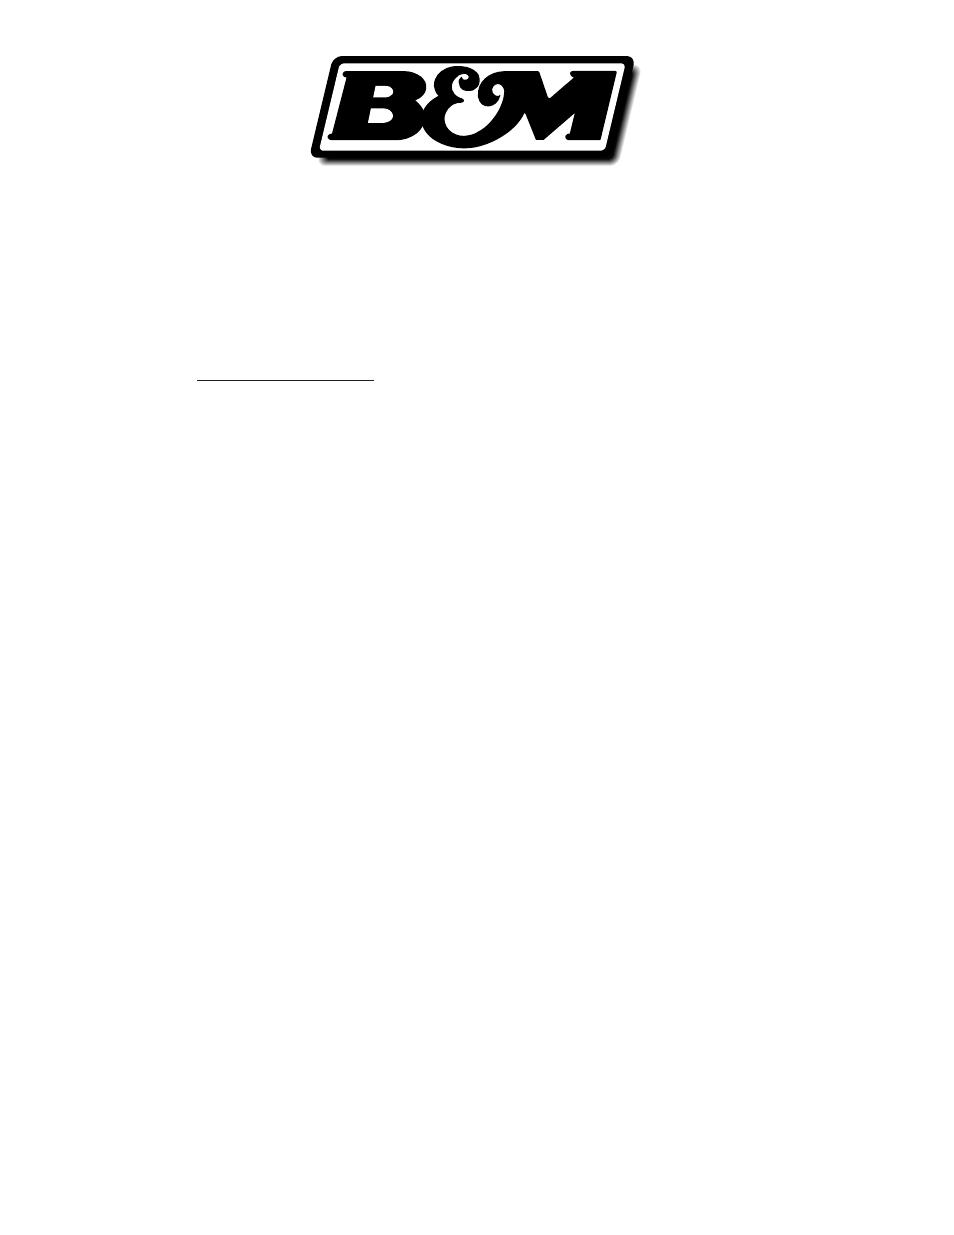 Bm 80885 Hammer Shifter User Manual 8 Pages